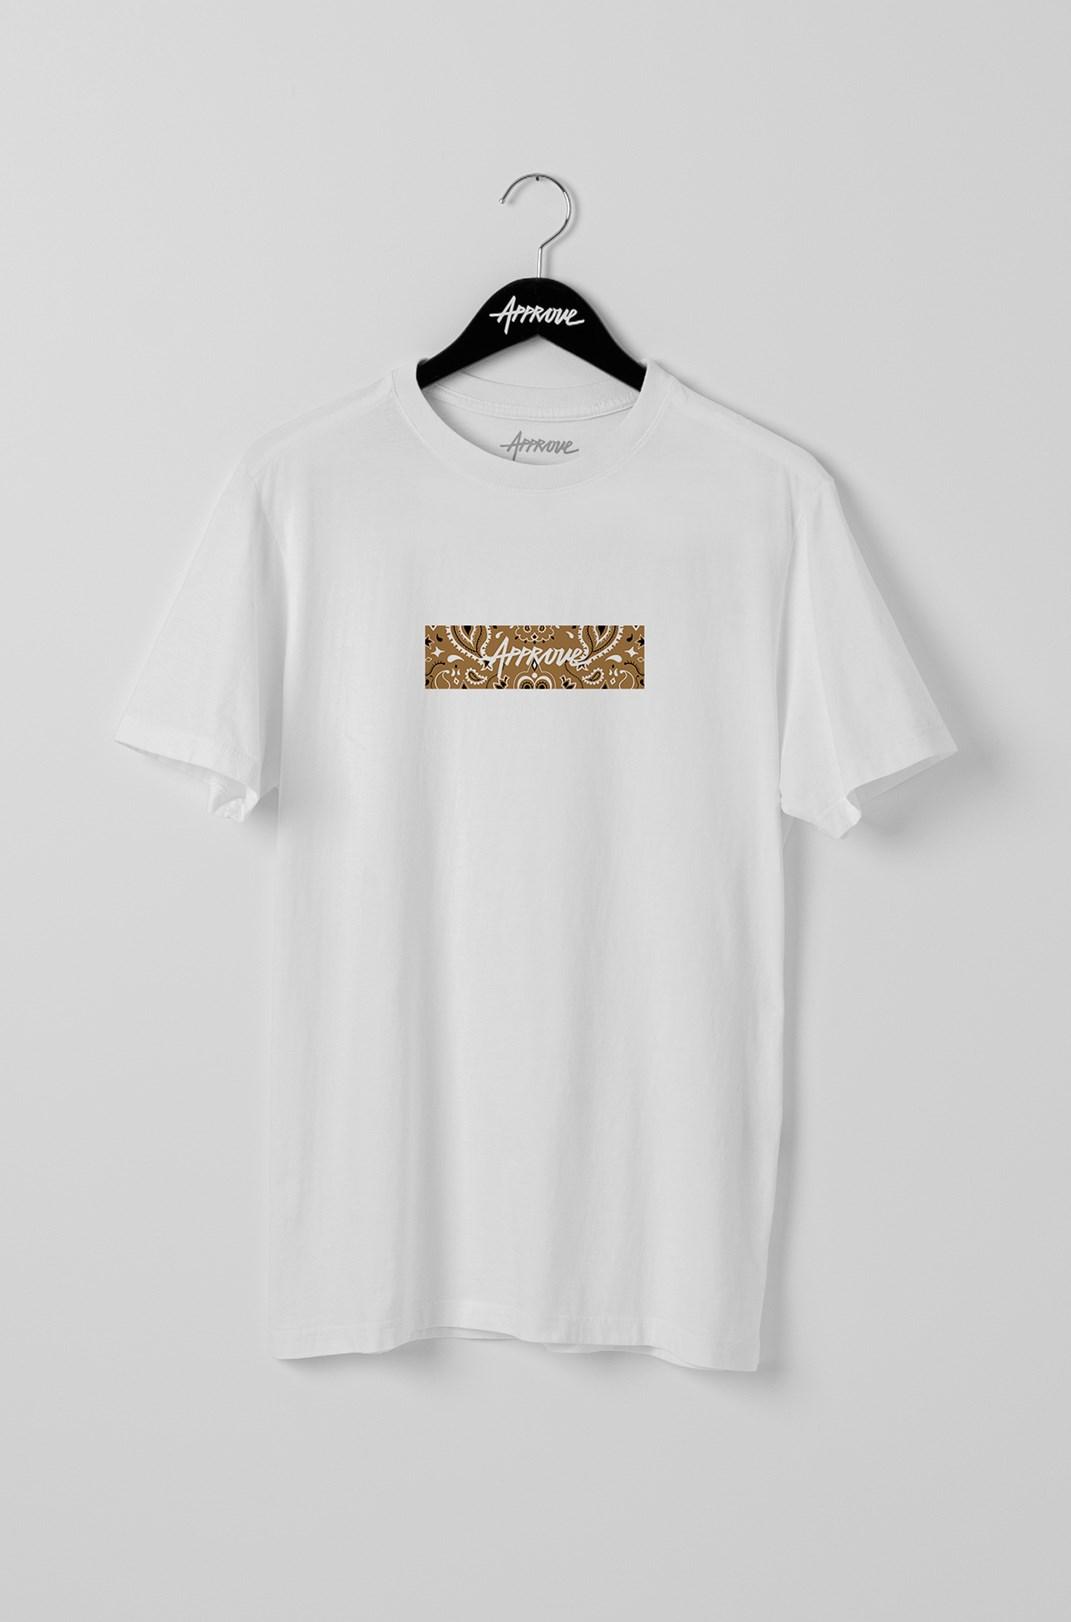 Camiseta Bold Approve Cashmere Branca E Bege